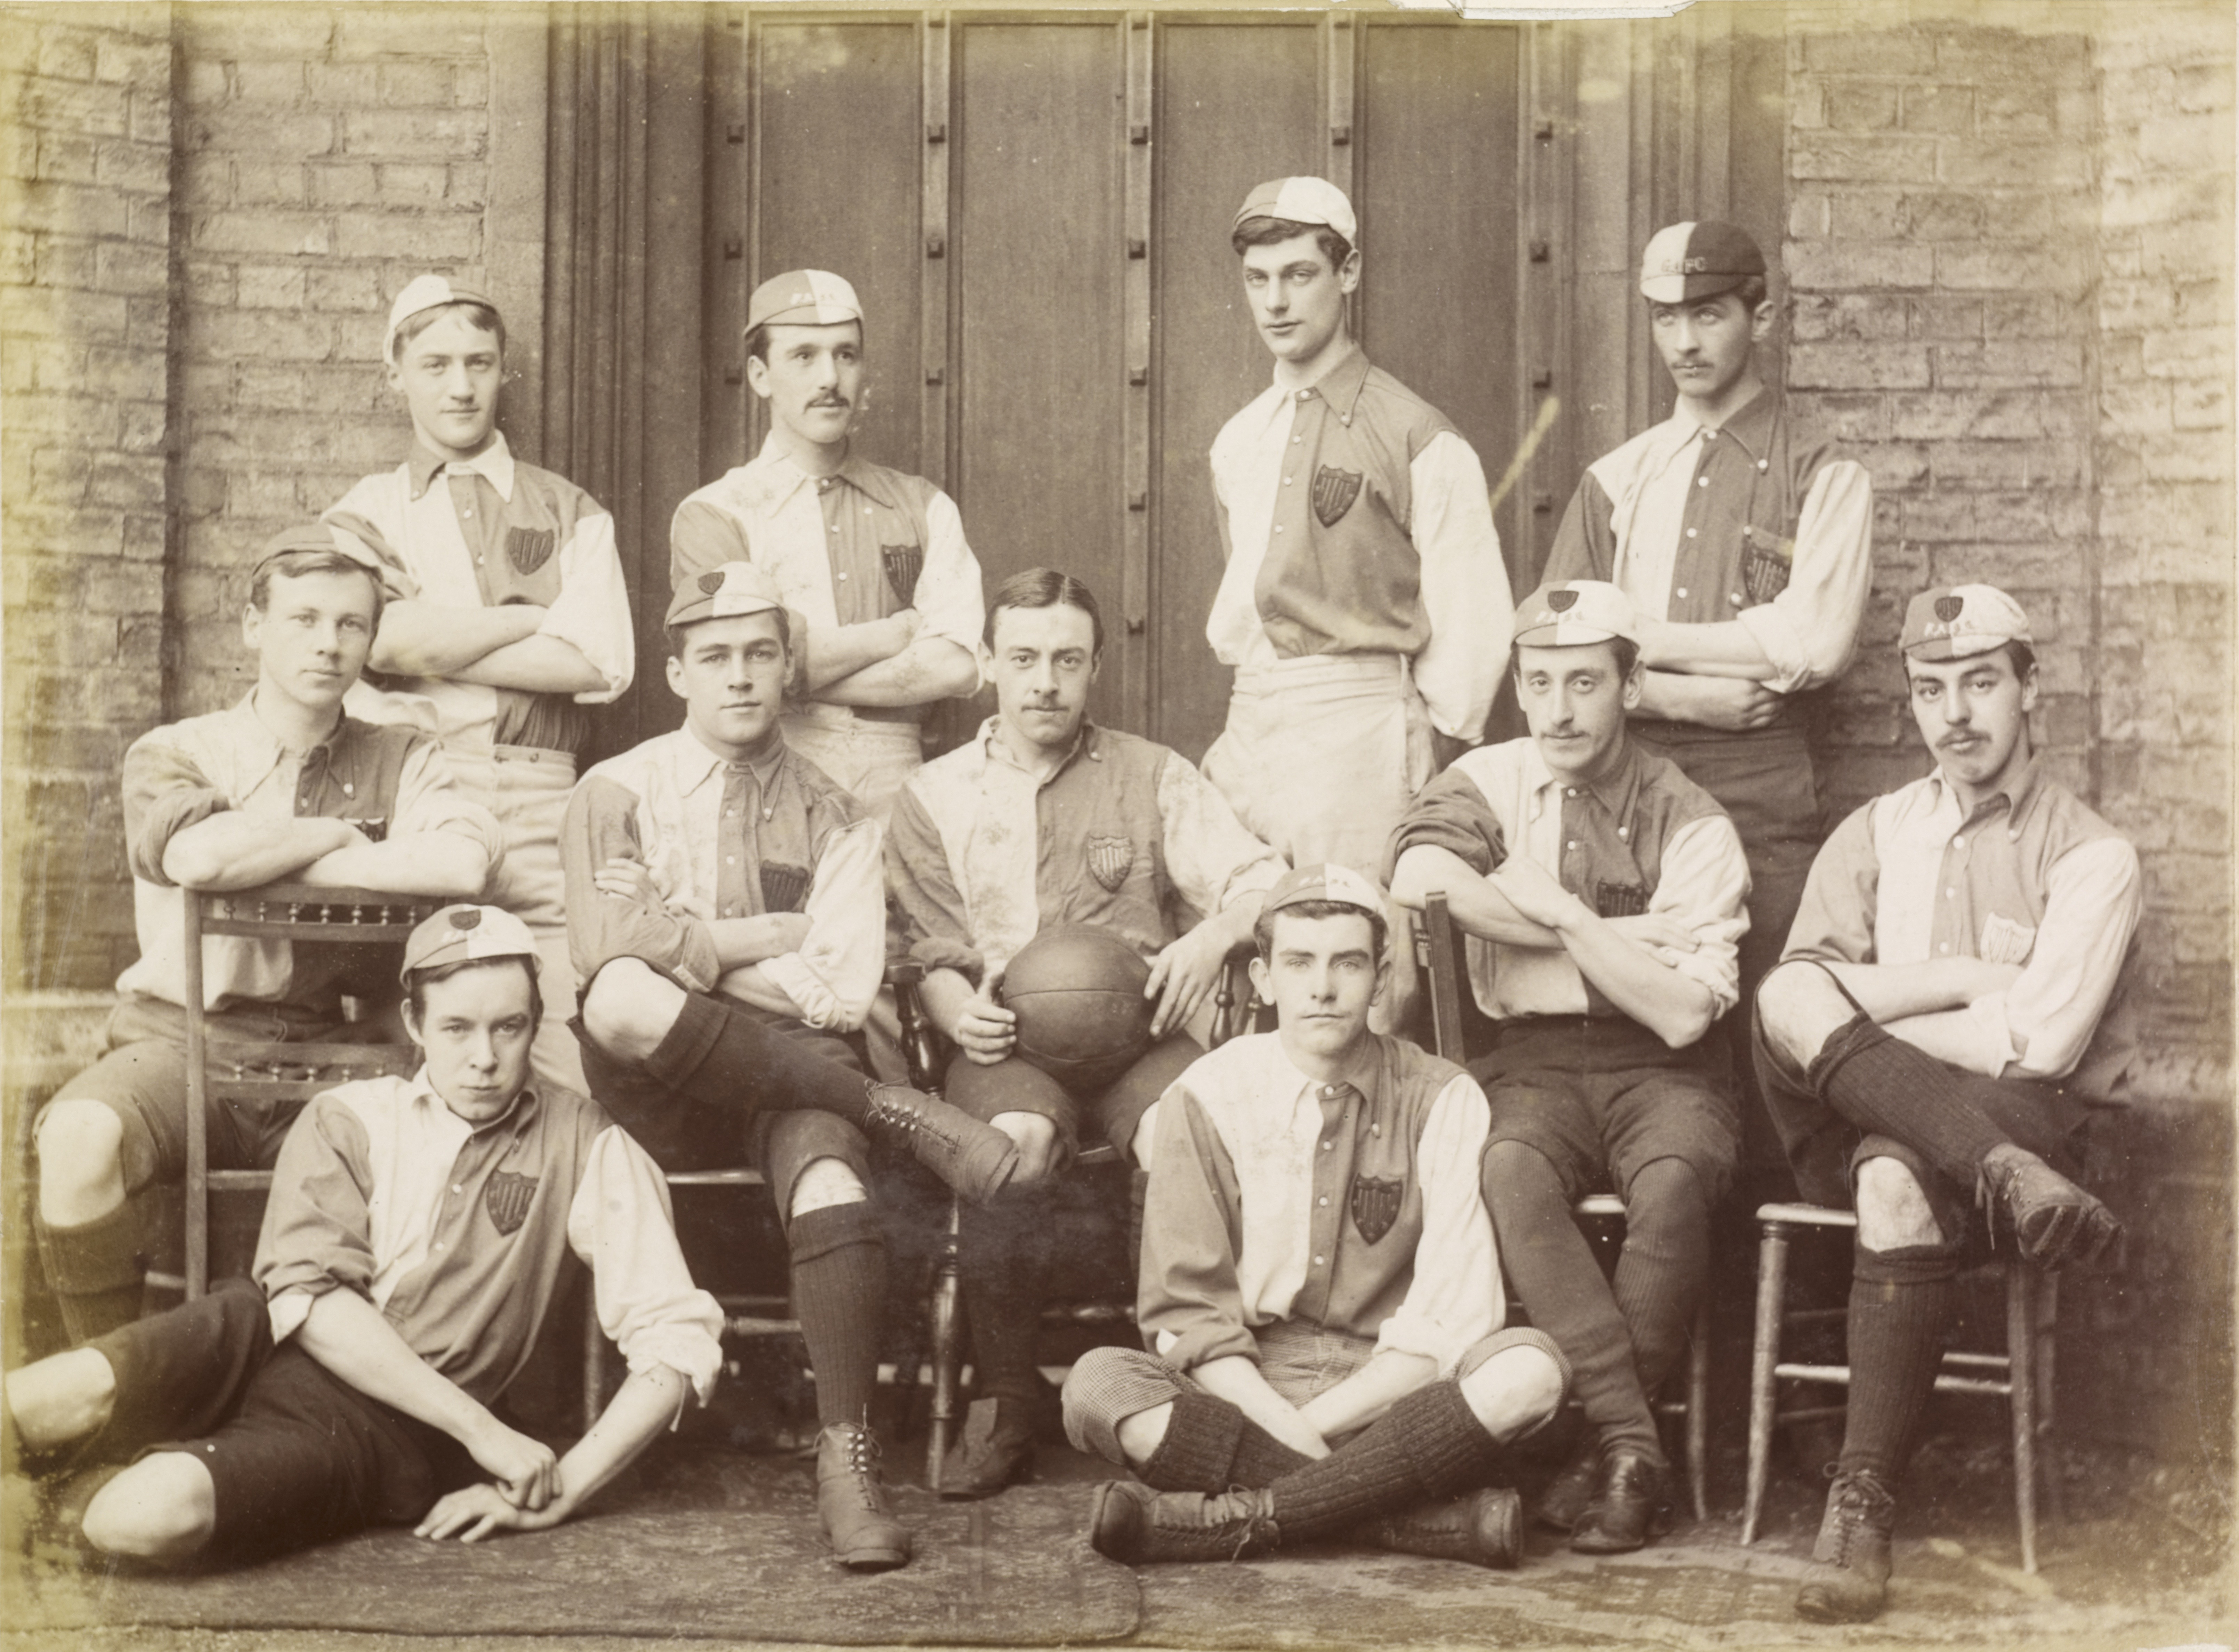 Peterhouse Association Football Team Autumn 1886